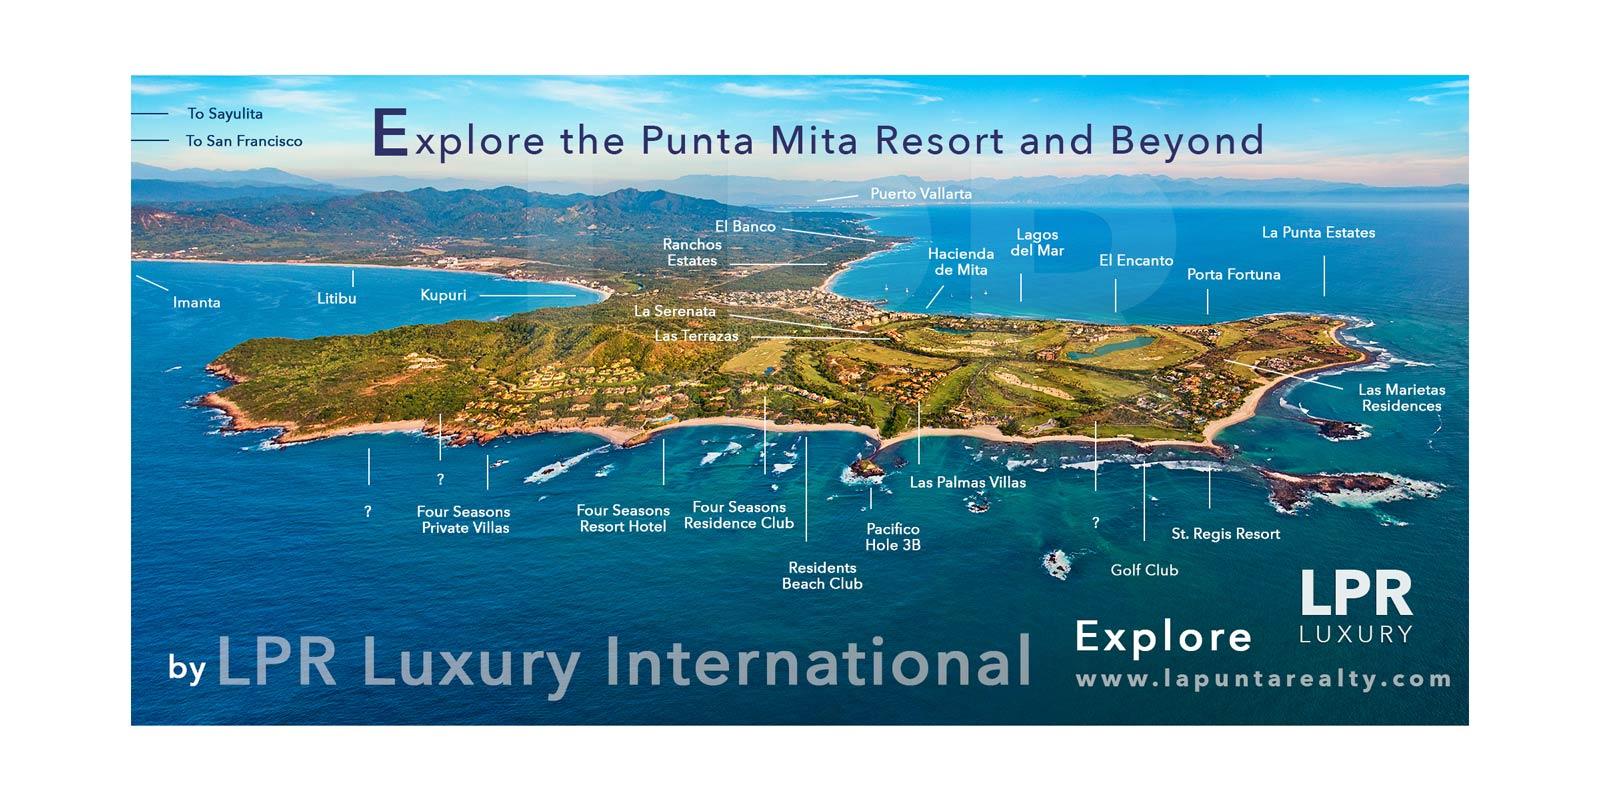 Explore The Punta Mita Resort Ultra Luxury Exclusive Riviera Nayarit Mexico